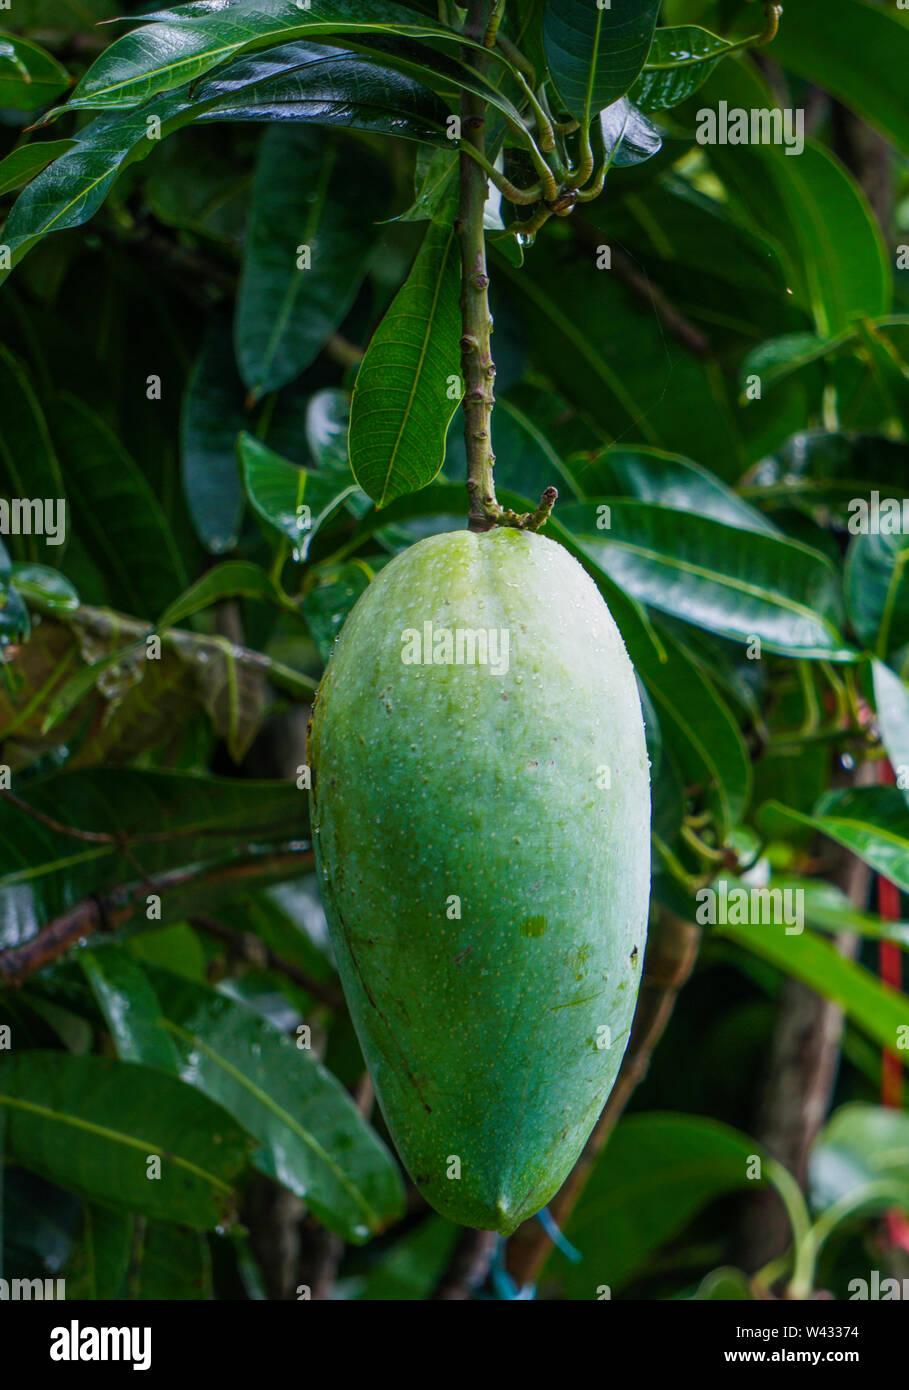 Green King Size Bangladeshi Maldaha Mango, Chapainawabganj gets New Mango - Stock Image